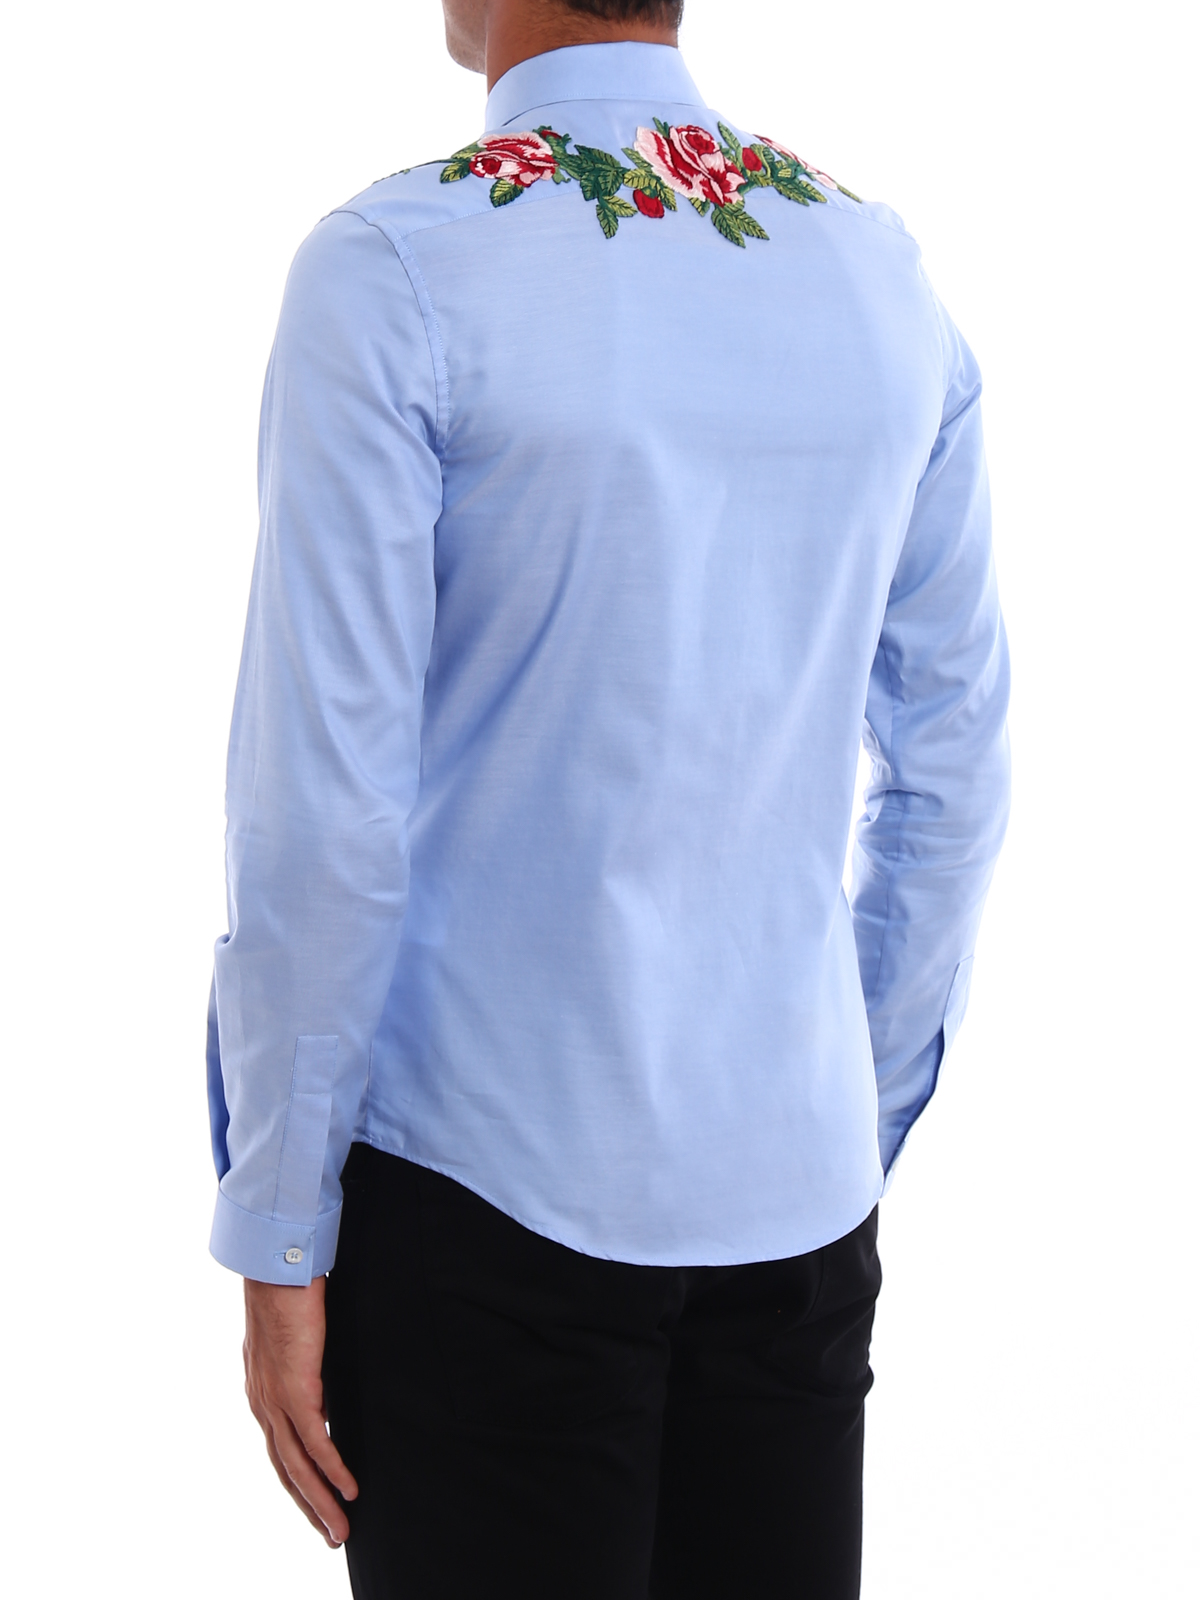 5c1a1dd94b945e Gucci - Duke embroidered cotton shirt - shirts - 478810Z338E 4910